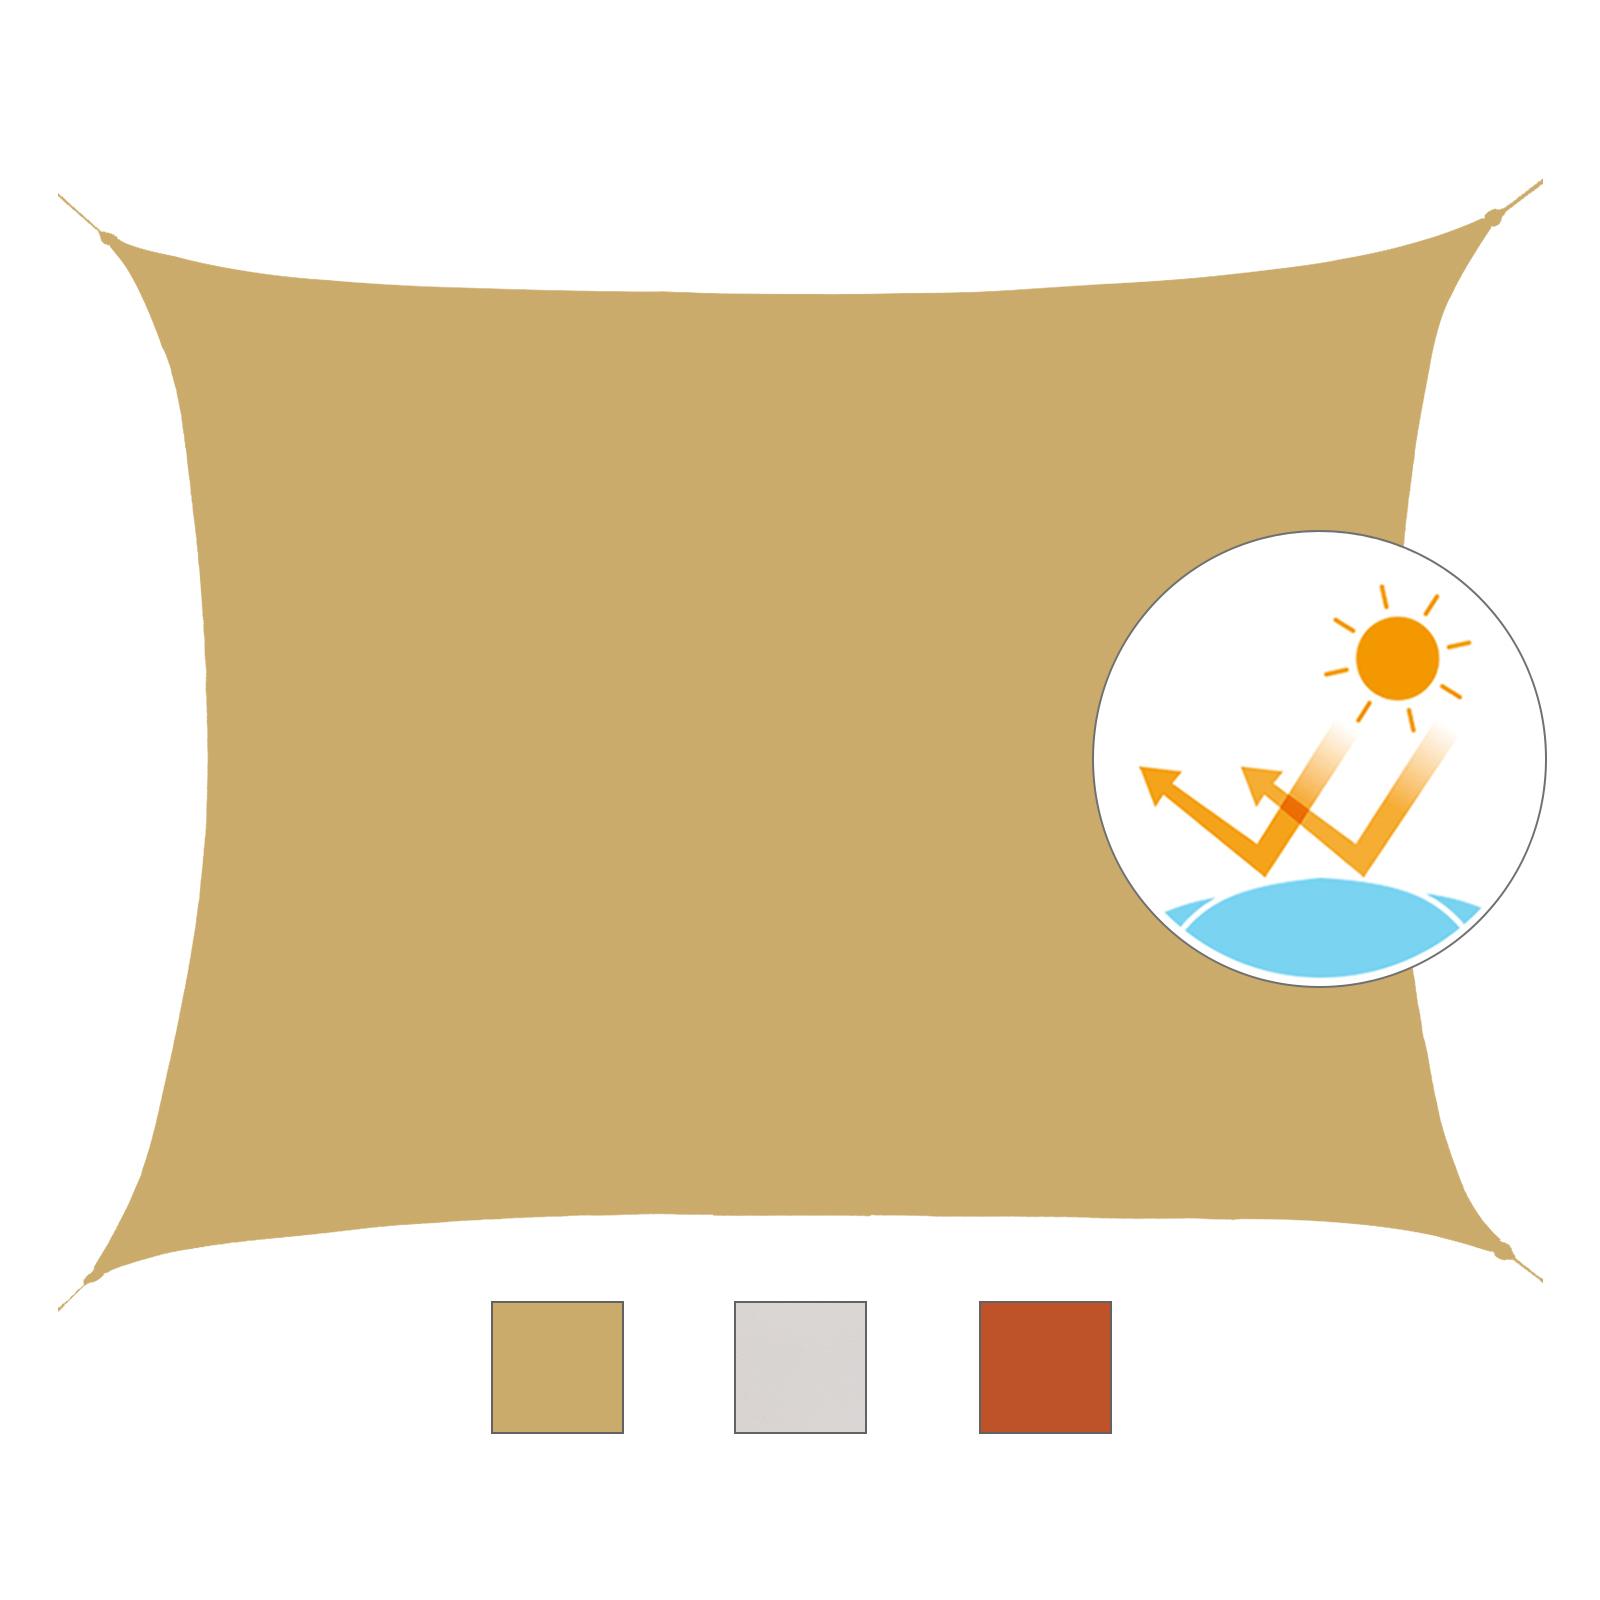 Toldo-de-Vela-Rectangular-para-Jardin-y-Exterior-Repelente-al-Agua-Proteccion-UV miniatura 3